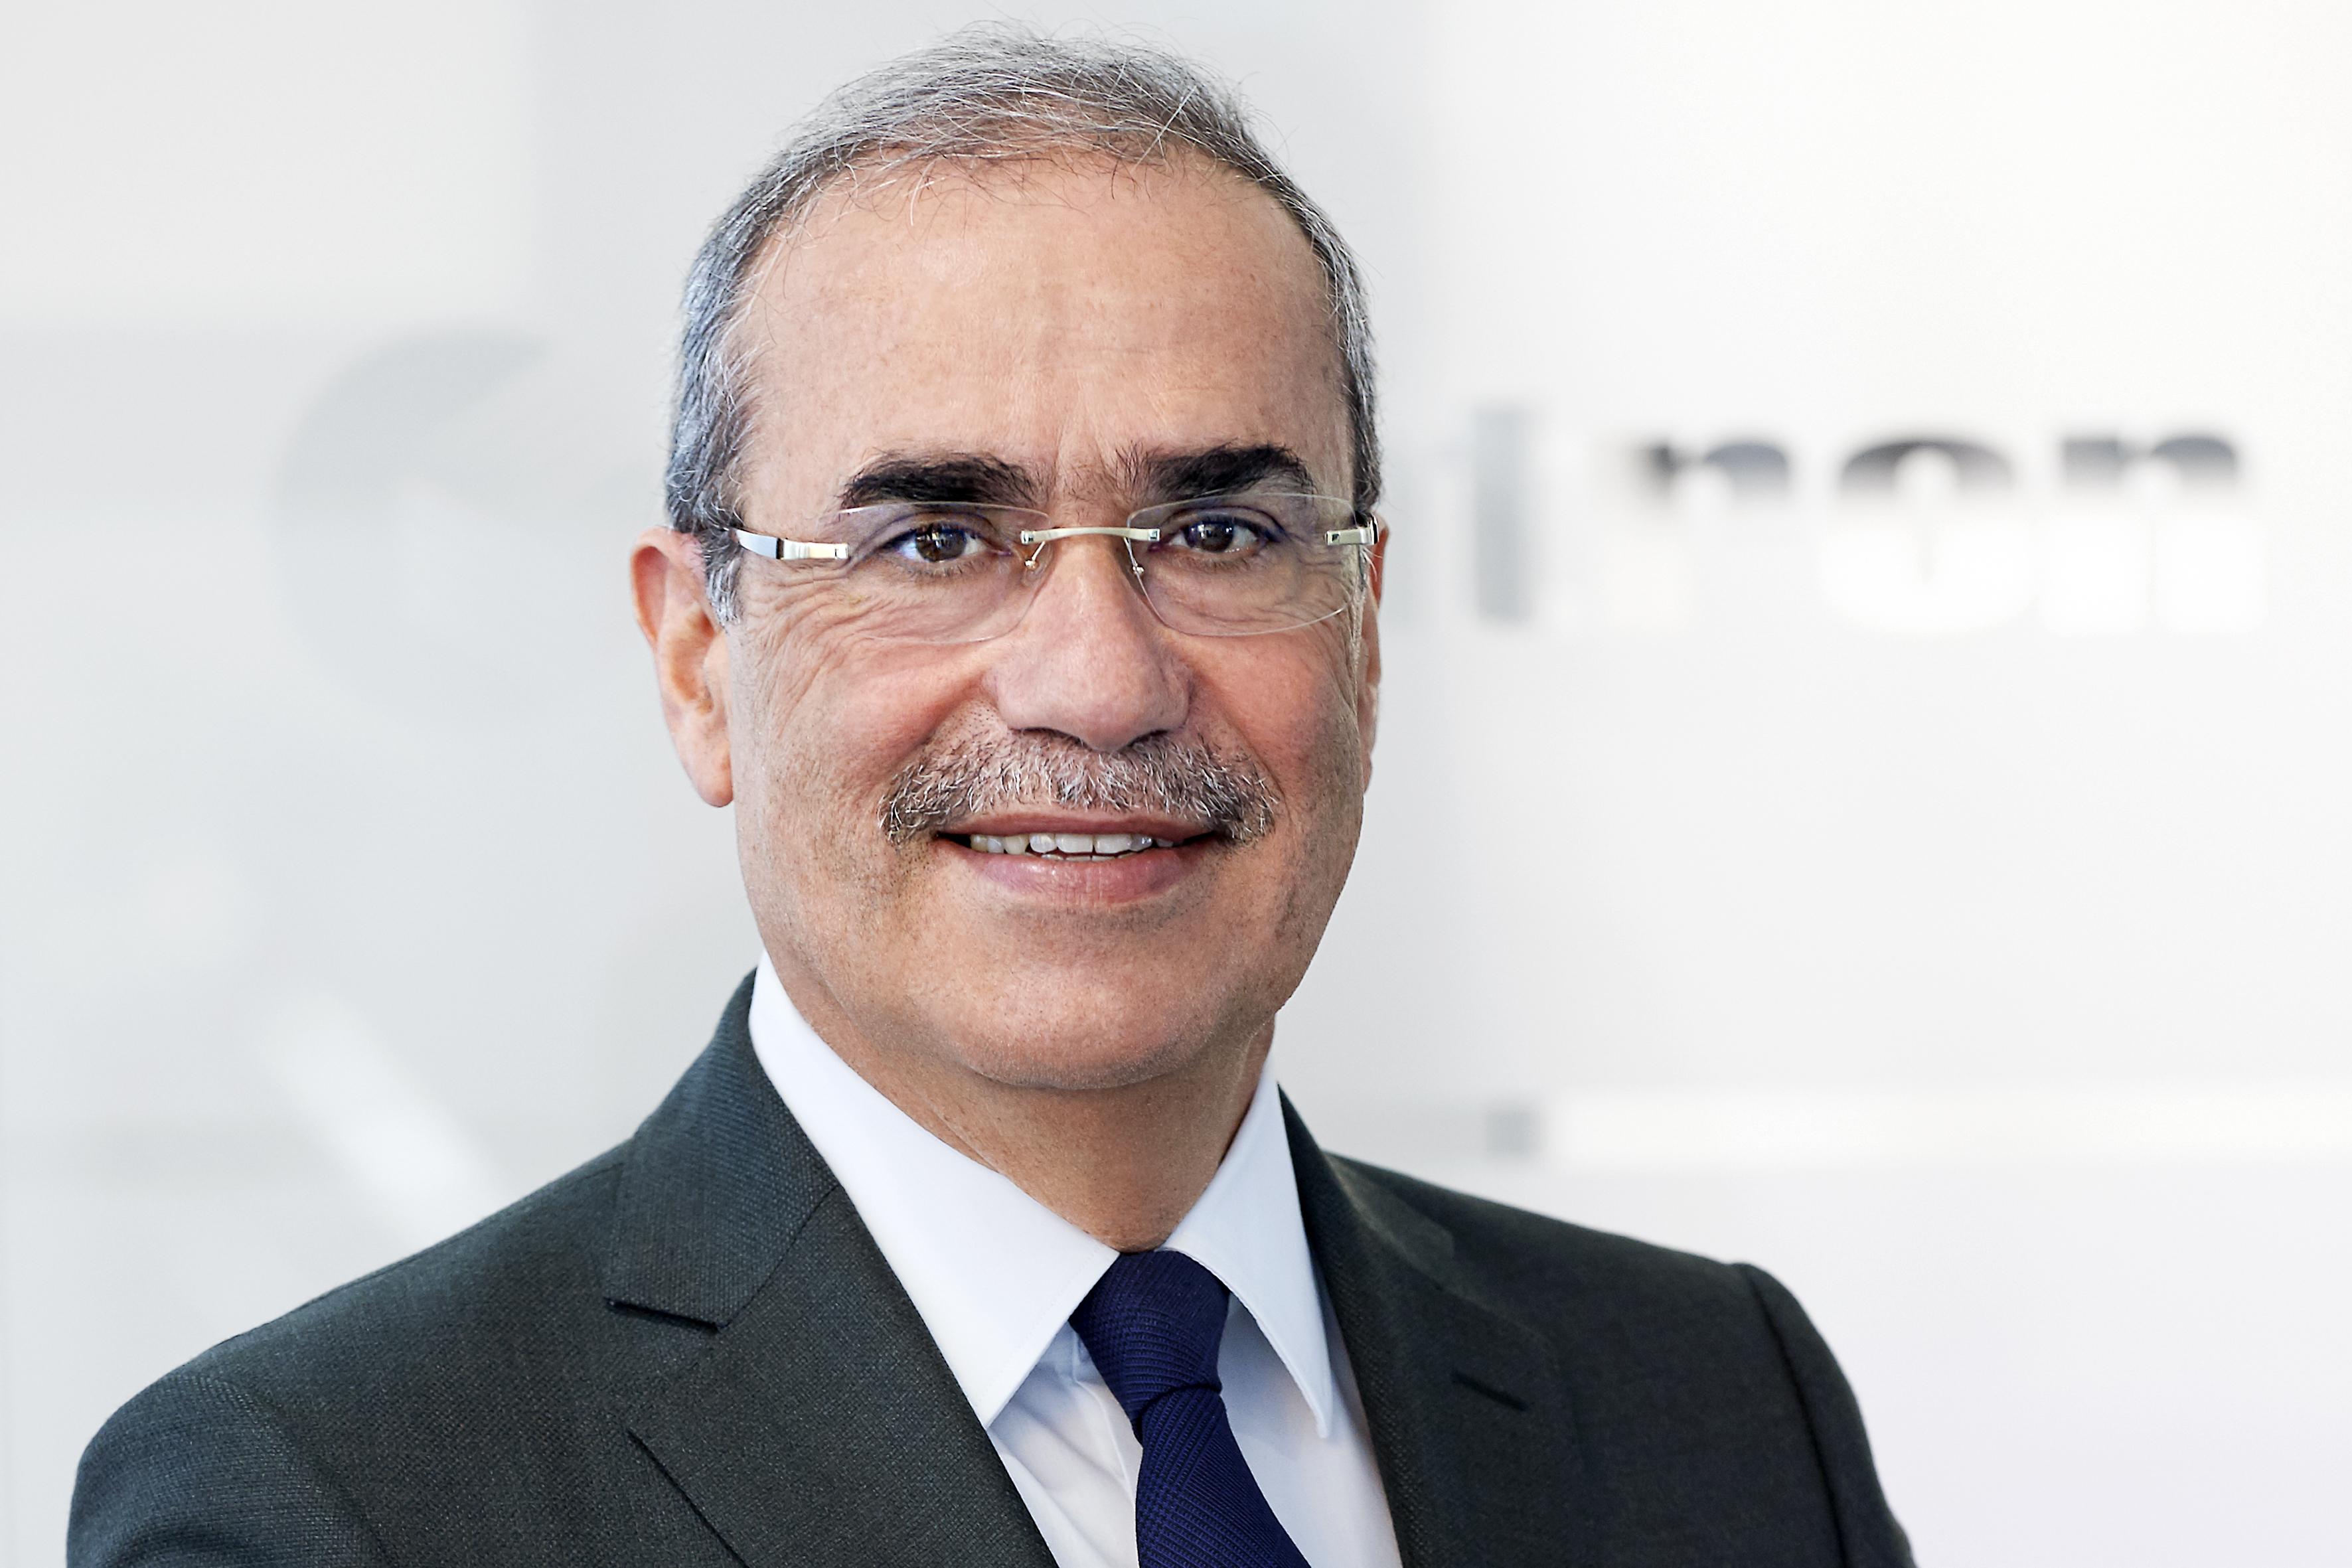 Carlos Queiroz, COO der S&T AG (Bild: Kontron S&T AG)